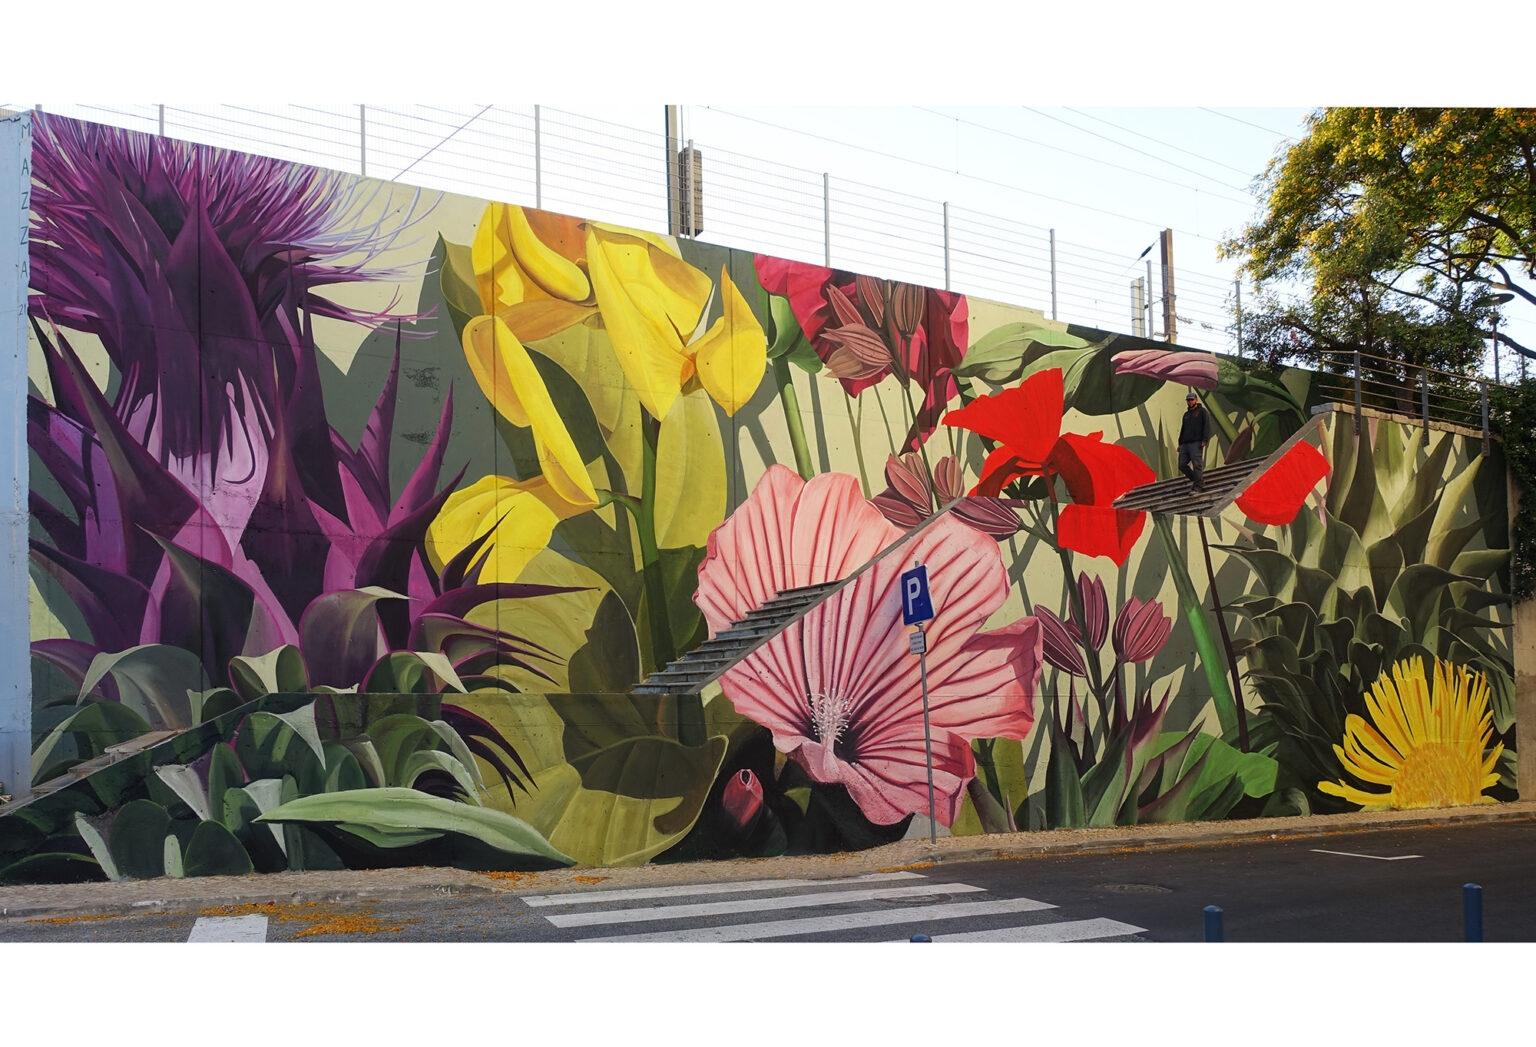 Mural by Thiago Mazza in Lisbon, Portugal